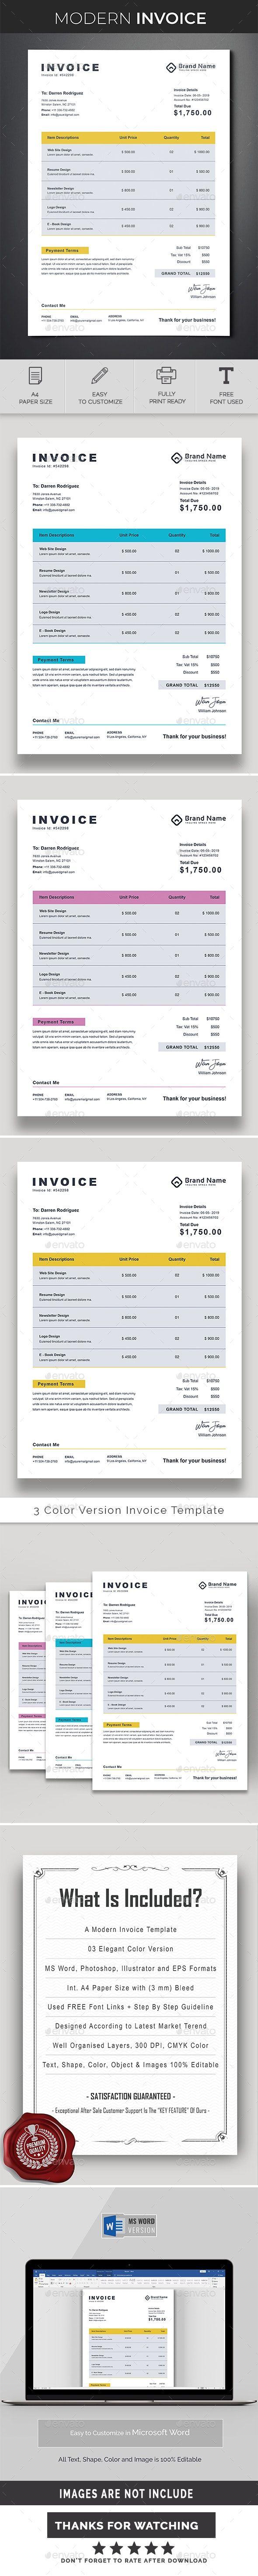 Clean Invoice Invoice Design Invoice Template Change Image